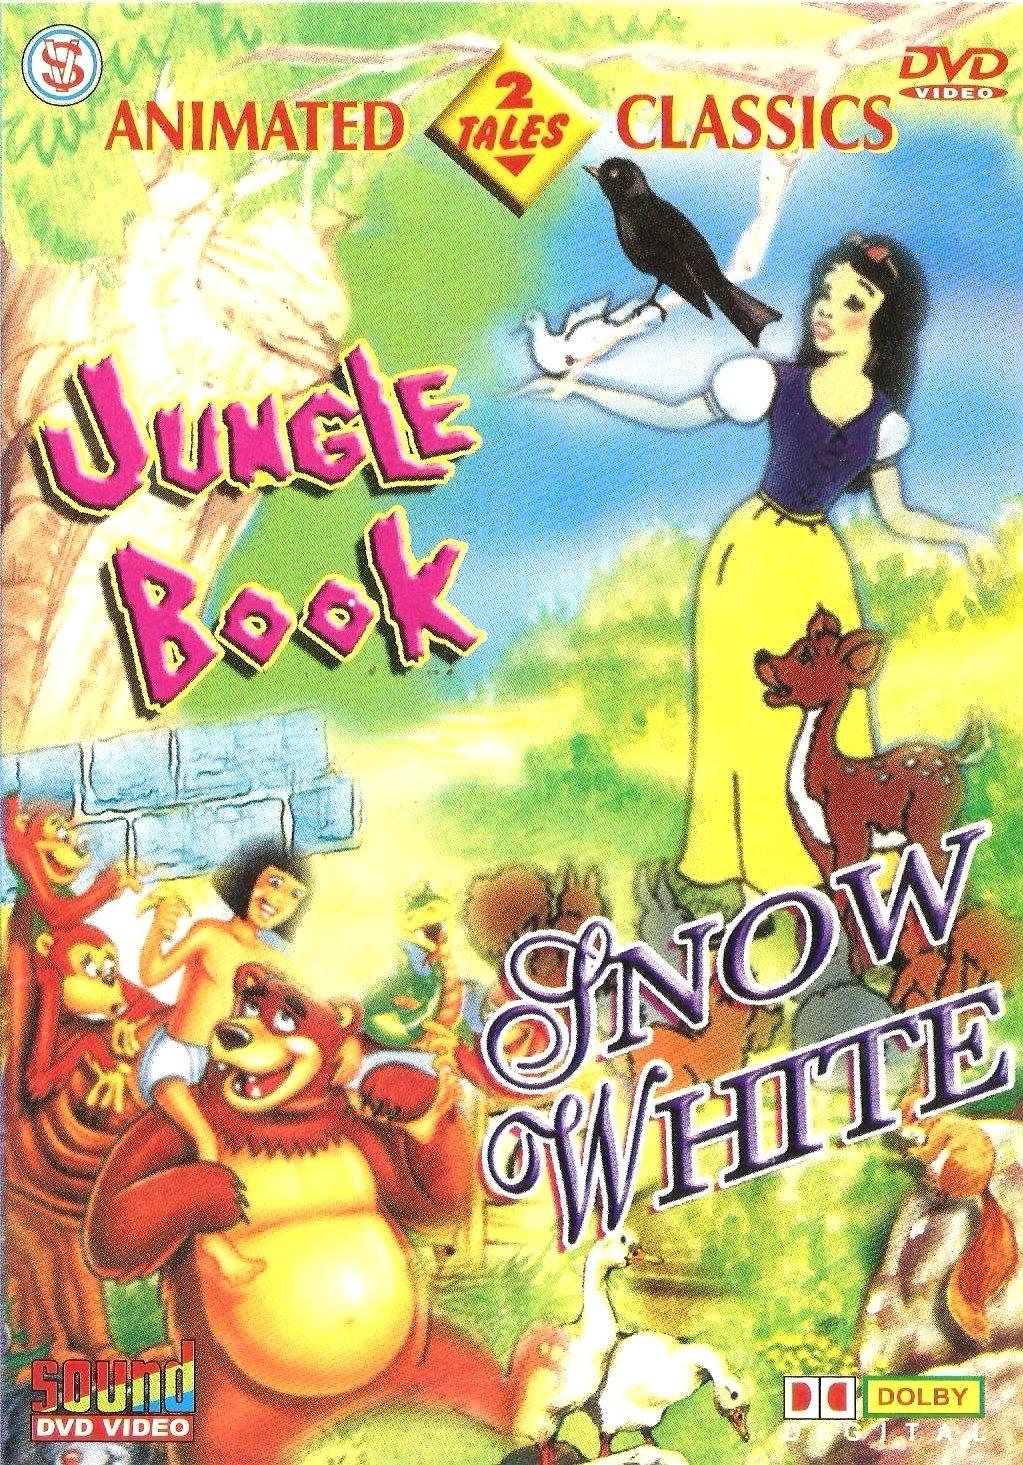 Jungle Book / Snow White (Cartoon) Movies DVD - Price In ...